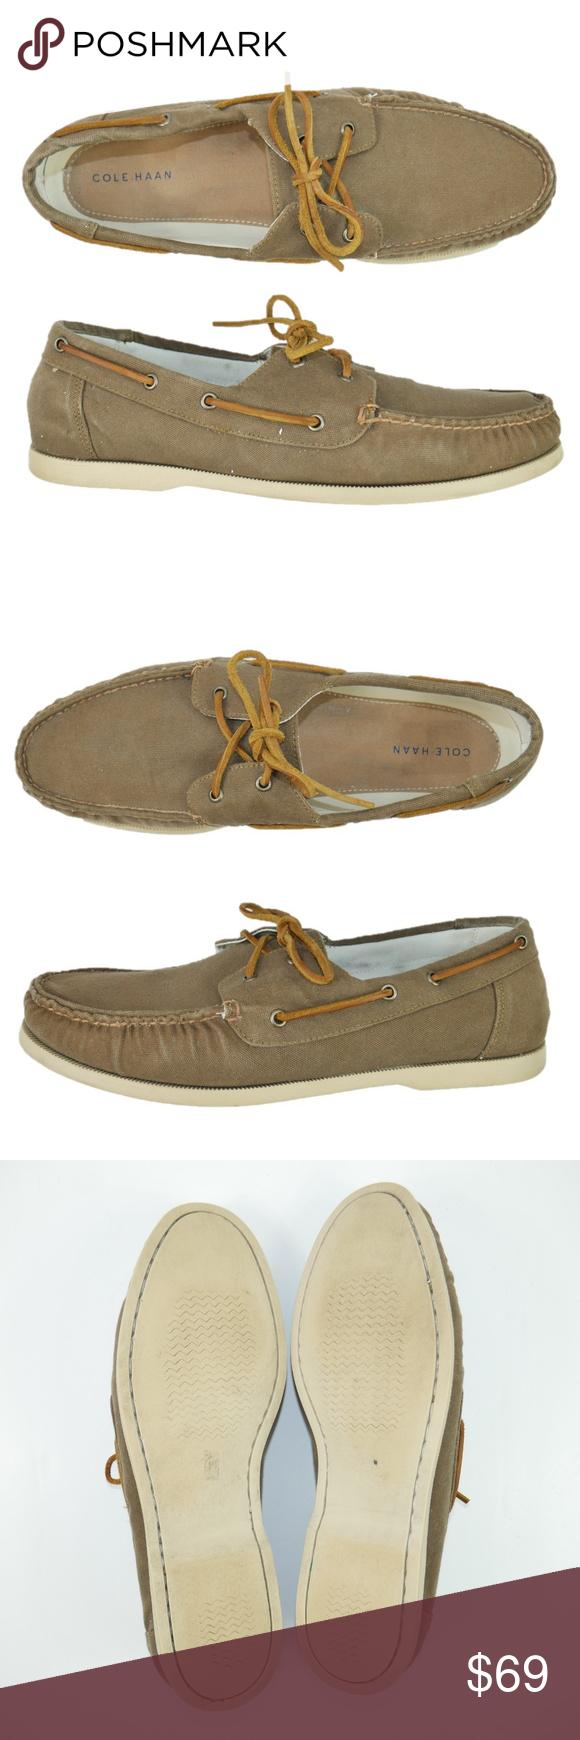 Cole Haan Non-slip Boat Deck Shoes